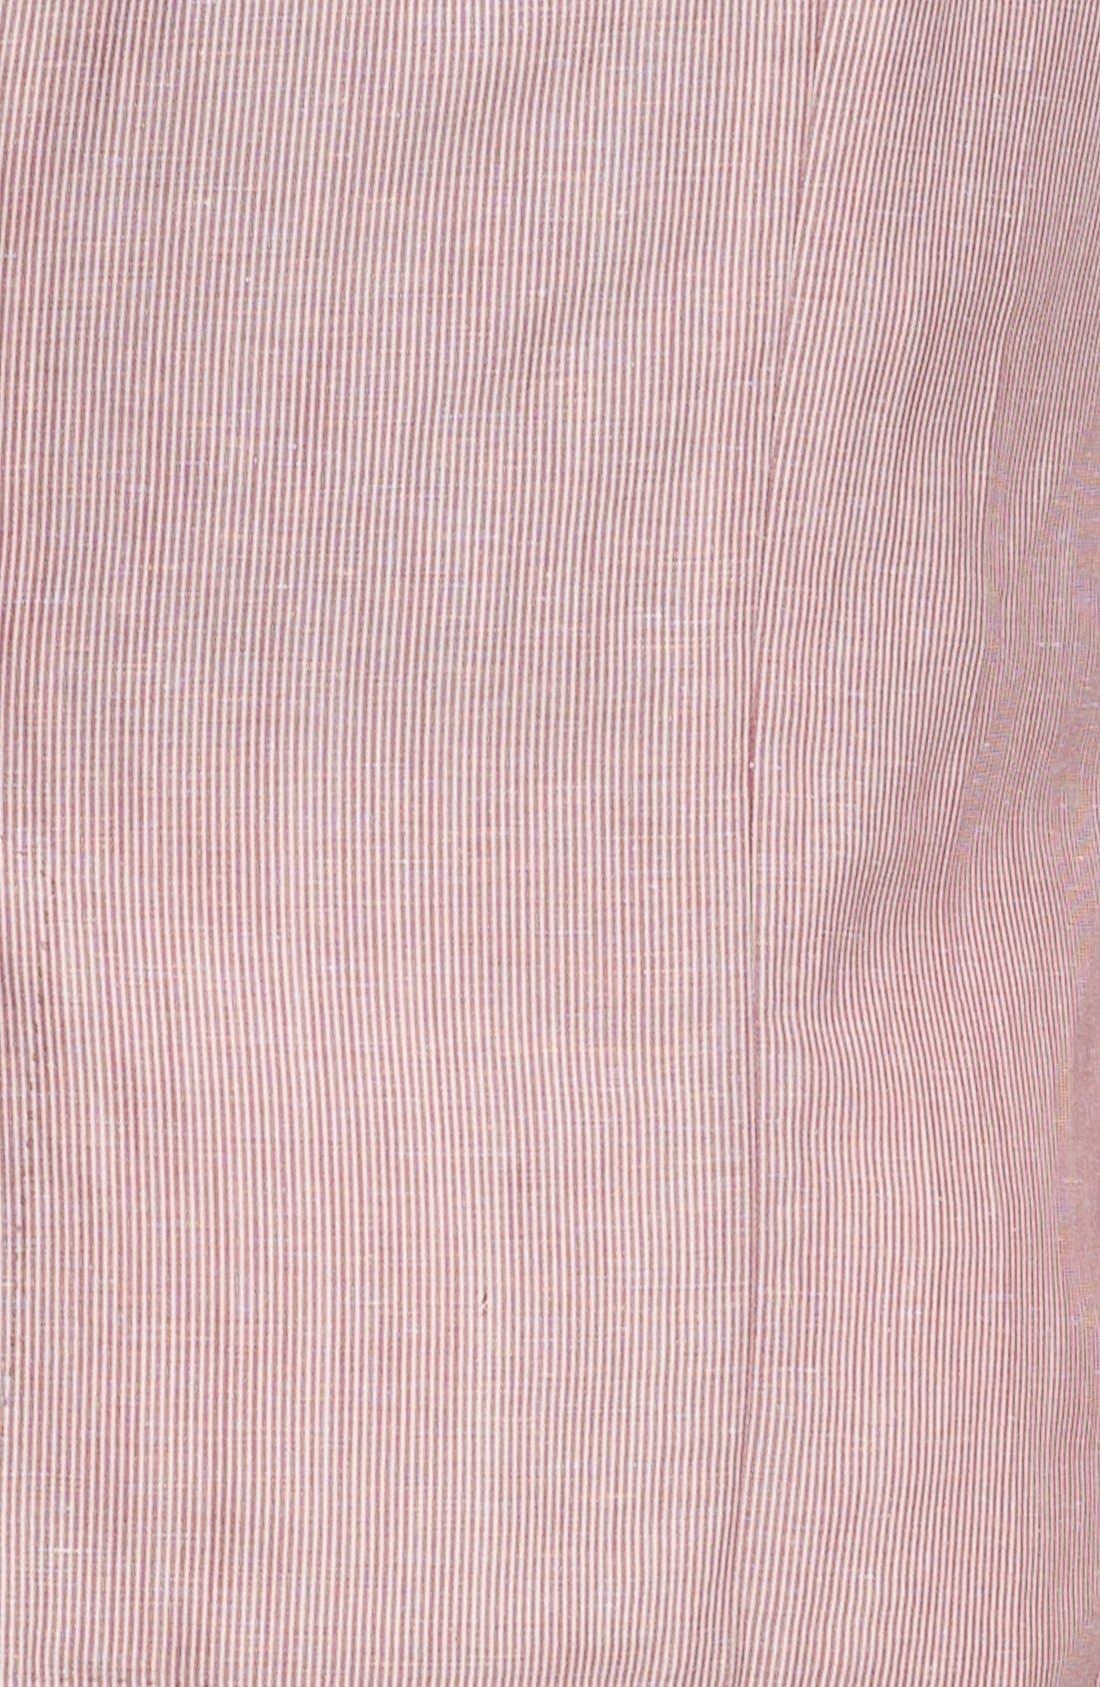 Alternate Image 3  - BOSS HUGO BOSS 'Miles' Trim Fit Stripe Sportcoat